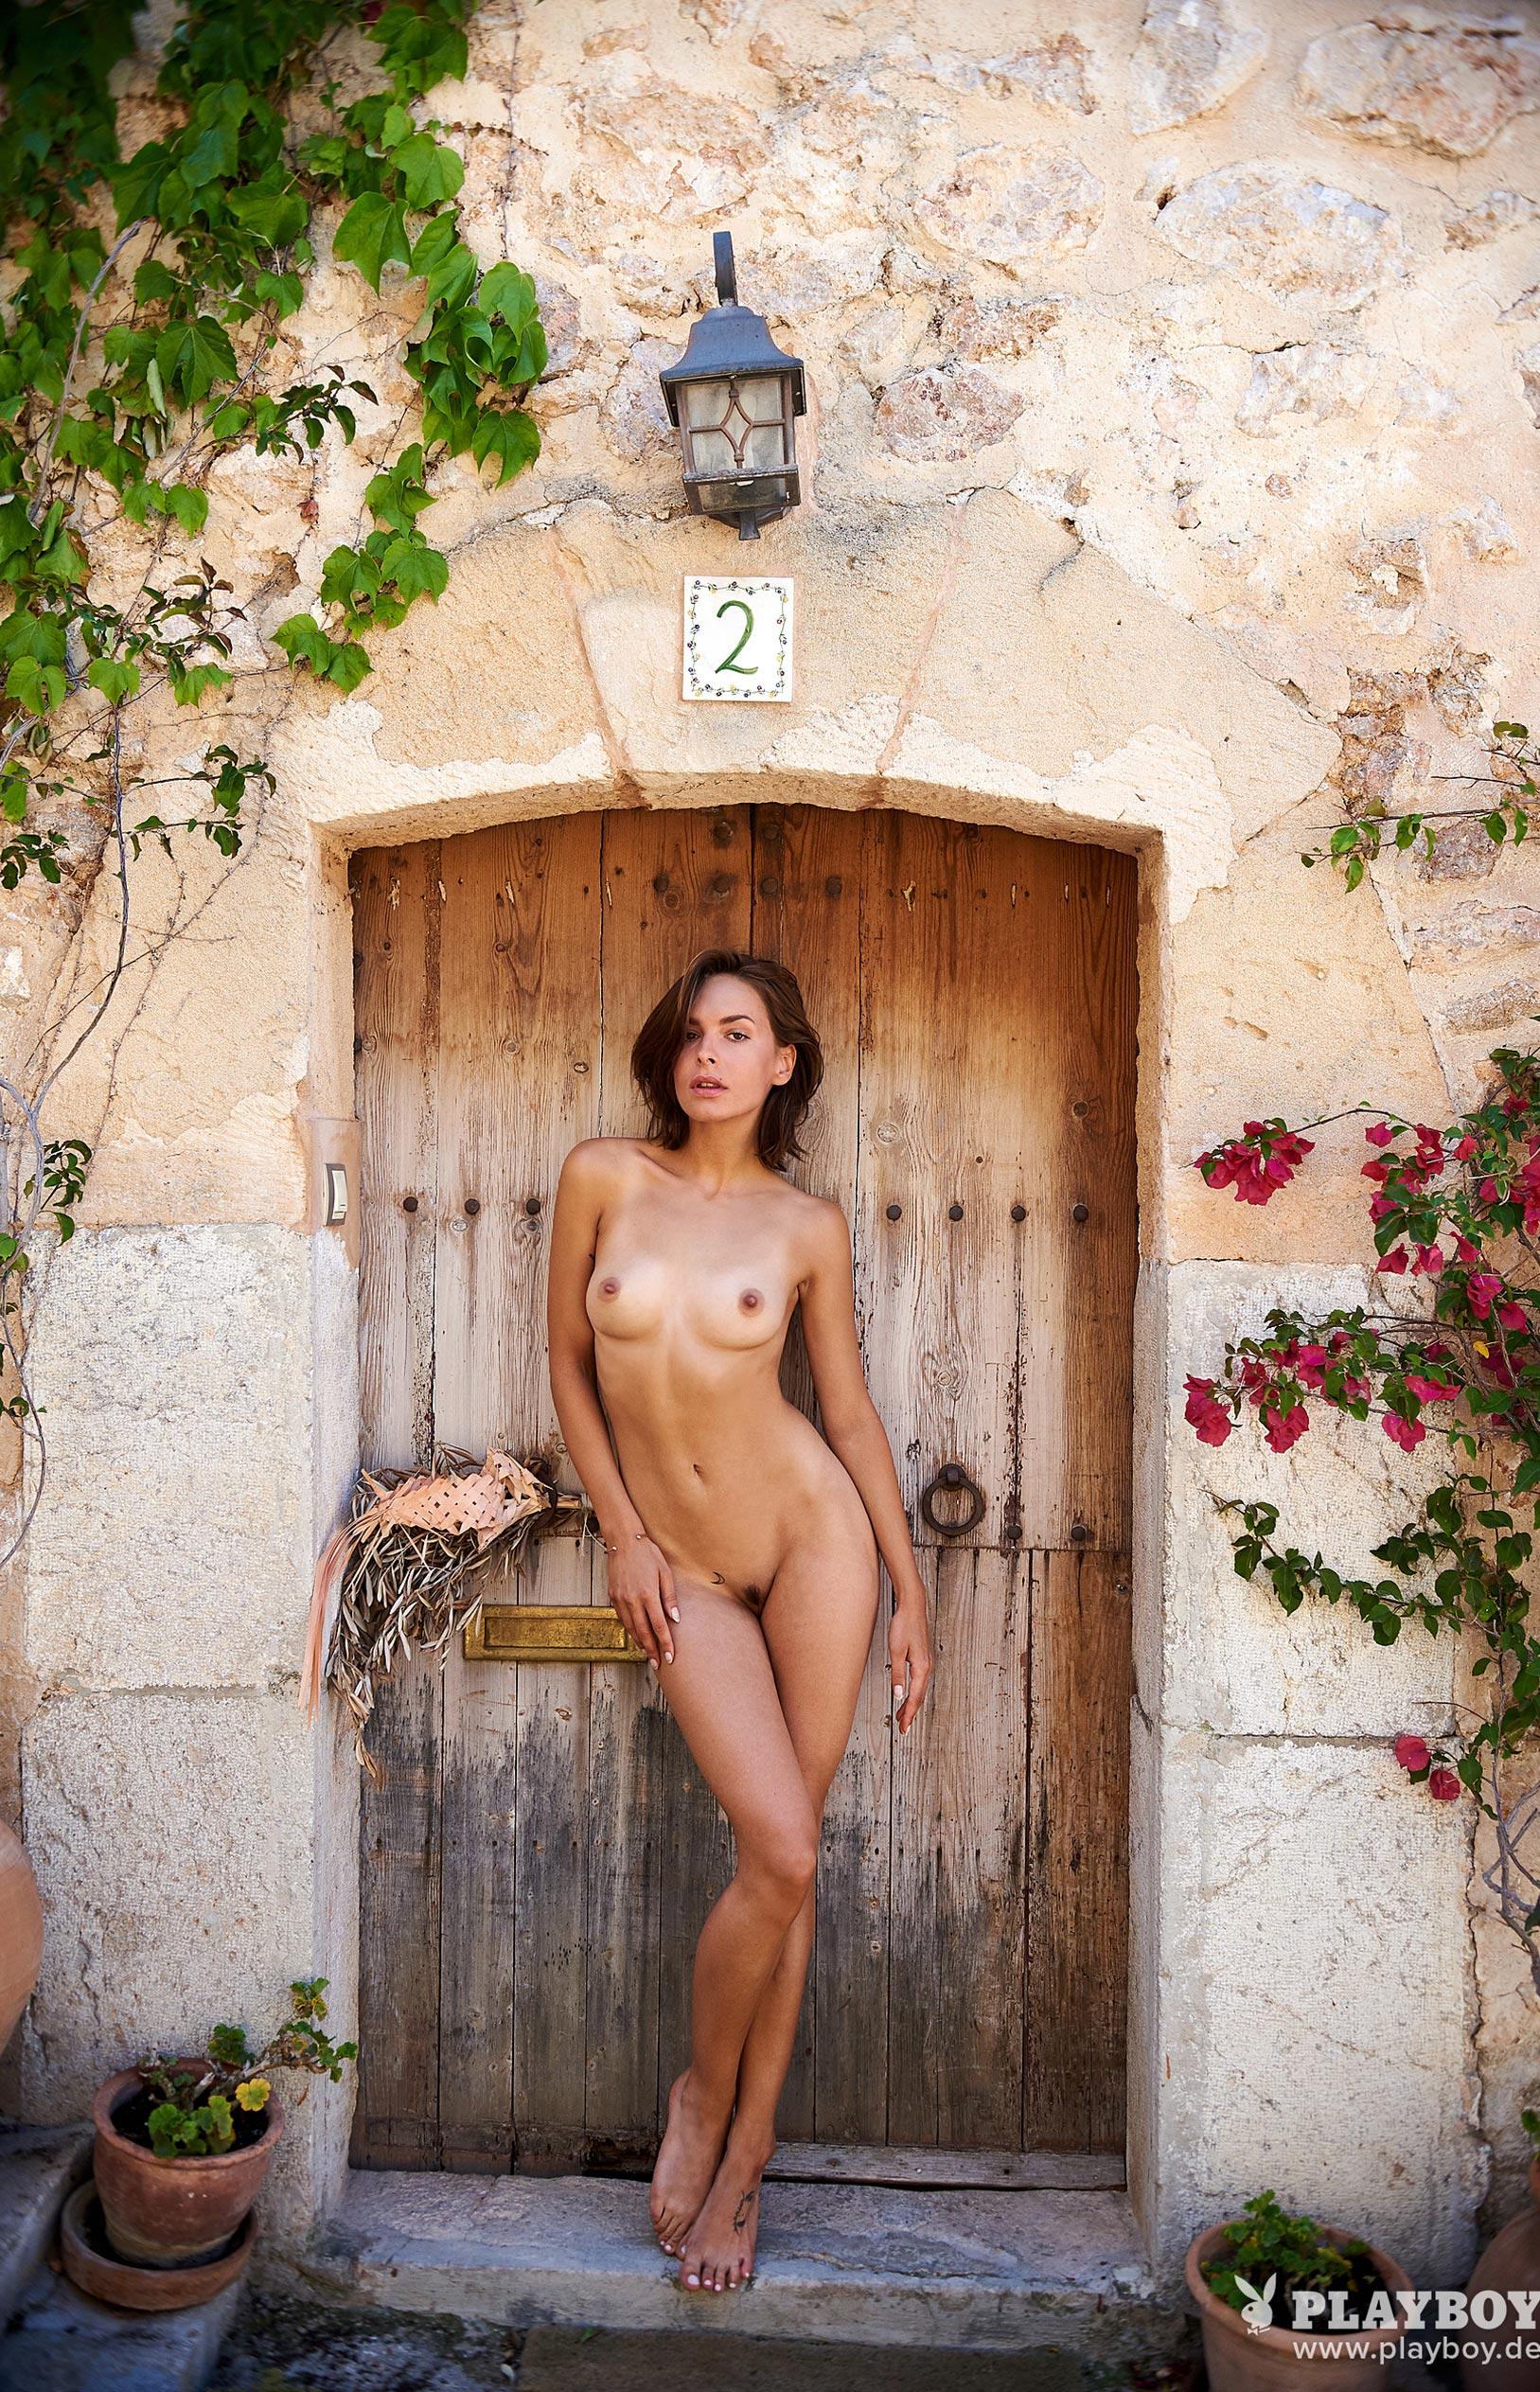 Оливия Пельцер - Девушка месяца Playboy Германия, сентябрь 2018 / фото 22